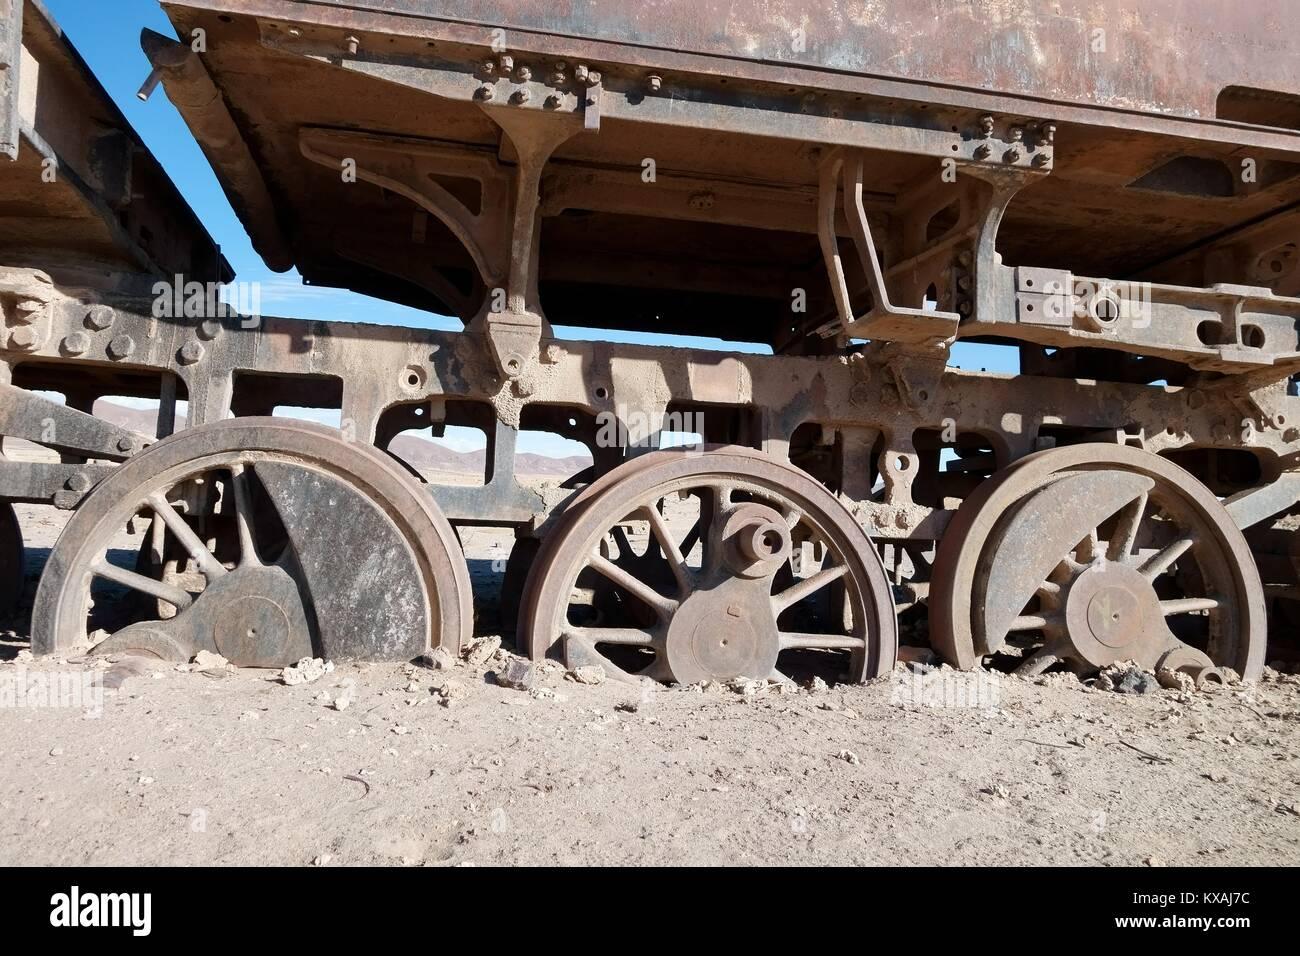 Wagon with sunken wheels at the railway cemetery, Uyuni, Potosi, Bolivia - Stock Image